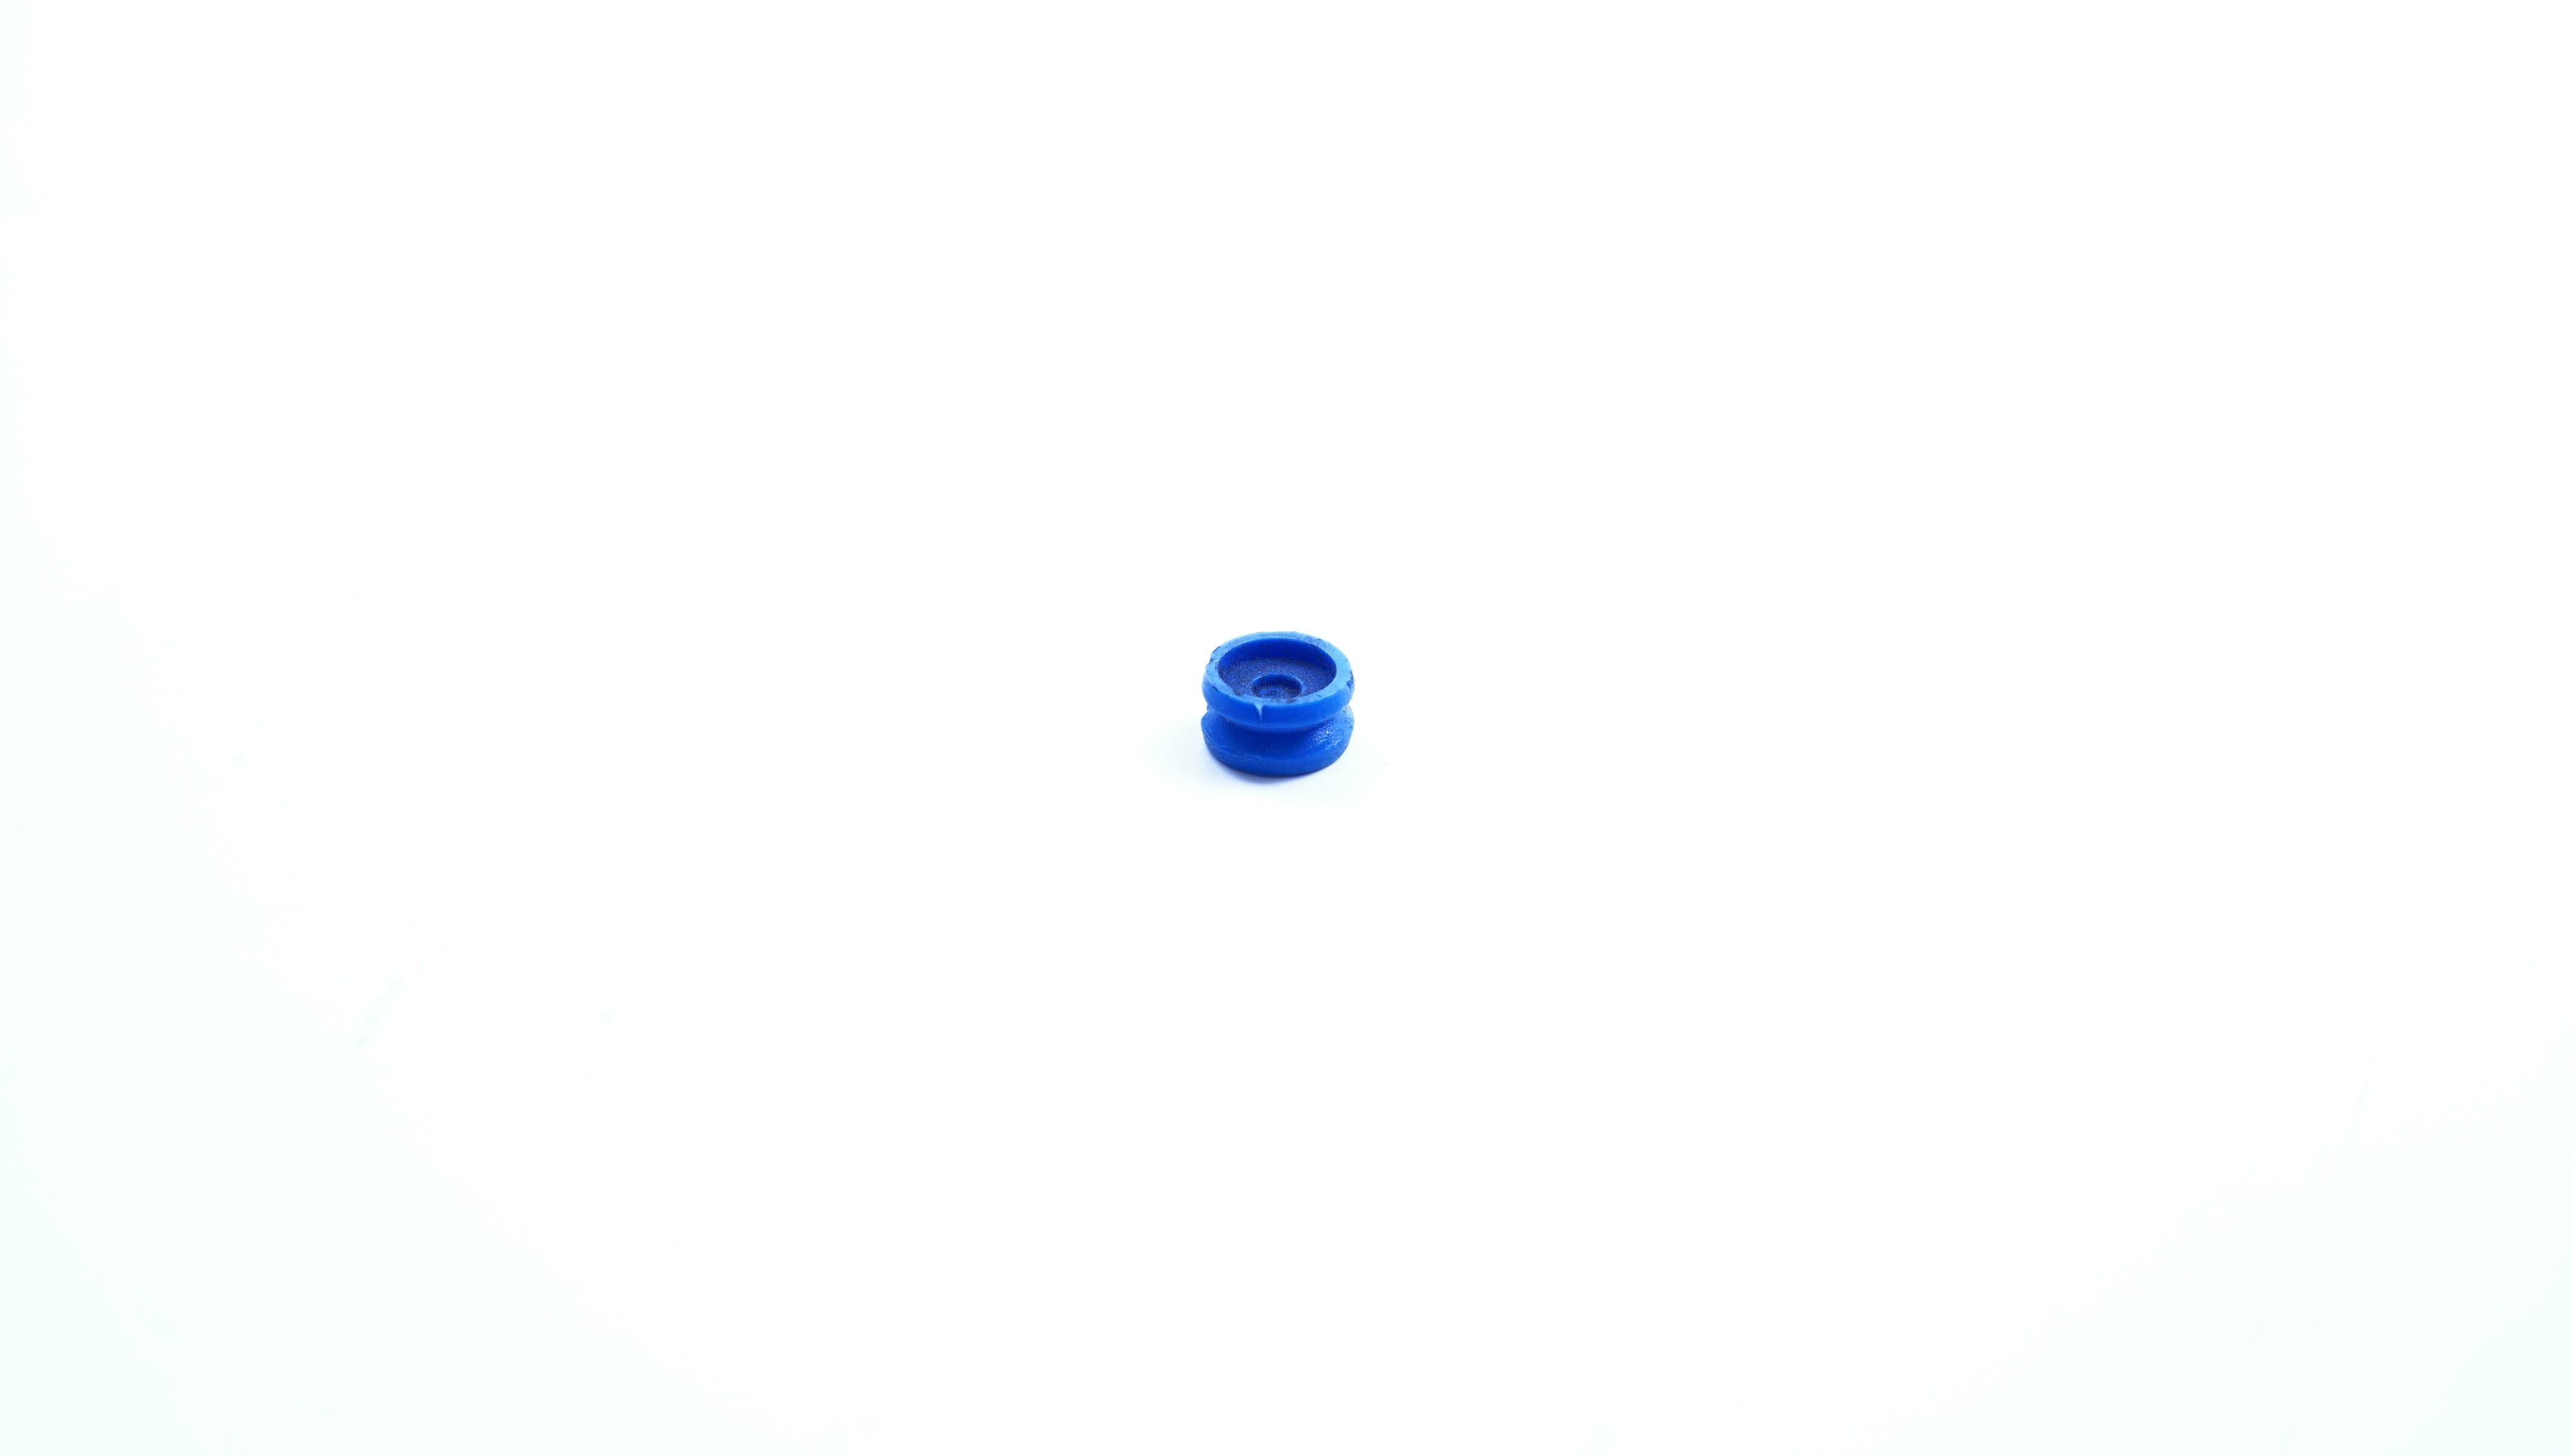 049 129 777 B Stopfen (blau)